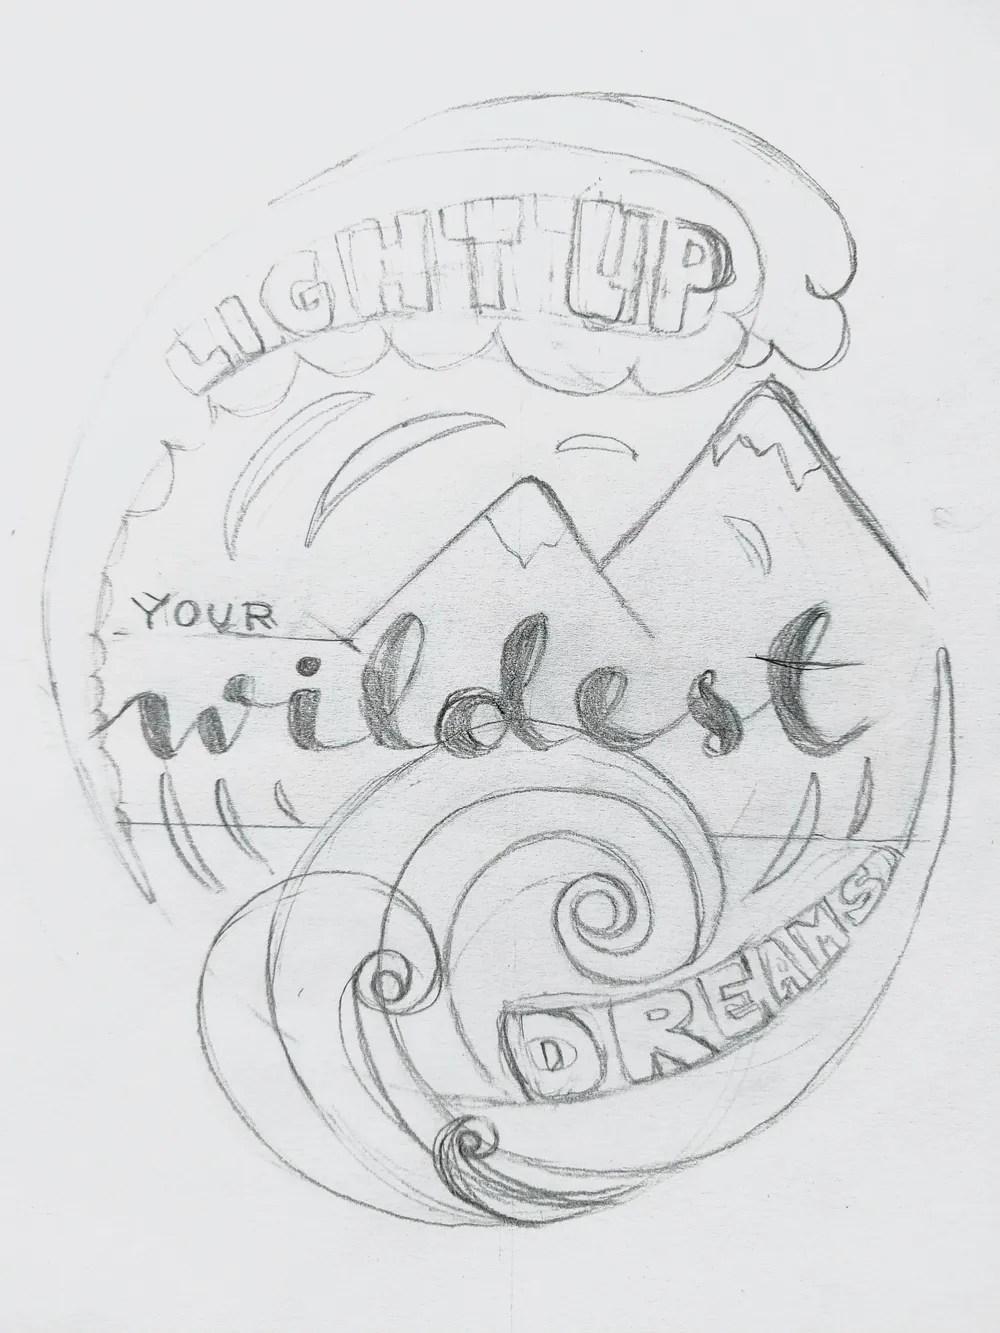 pix Light Up Your Wildest Dreams light up your wildest dreams